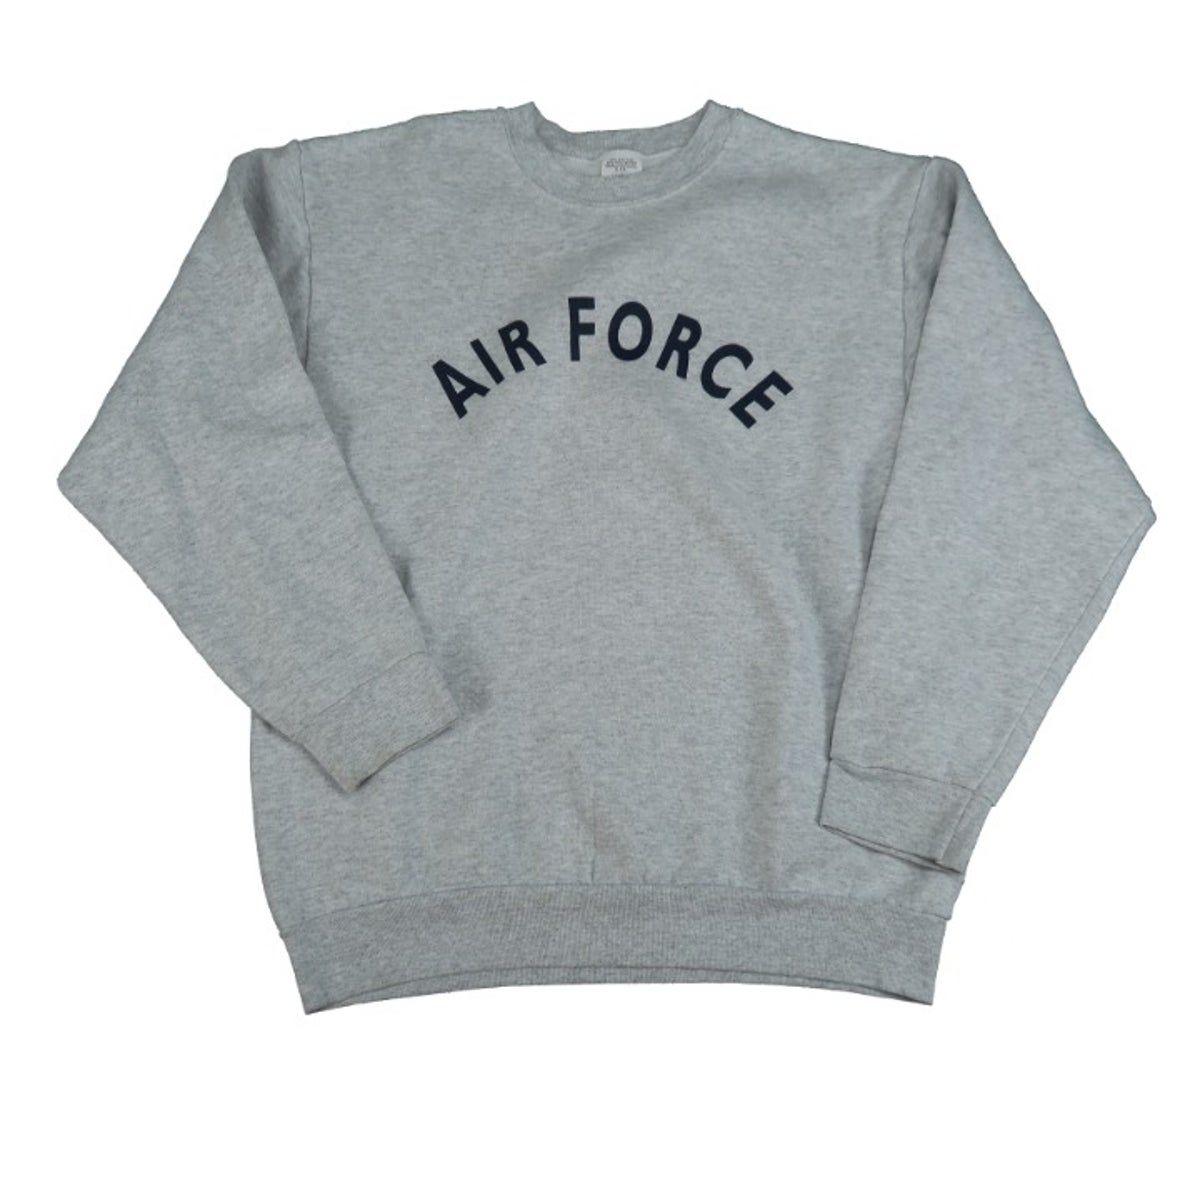 Vtg Us Air Force Usaf Sweatshirt S Air Force Sweatshirt Sweatshirts Us Air Force [ 1200 x 1200 Pixel ]